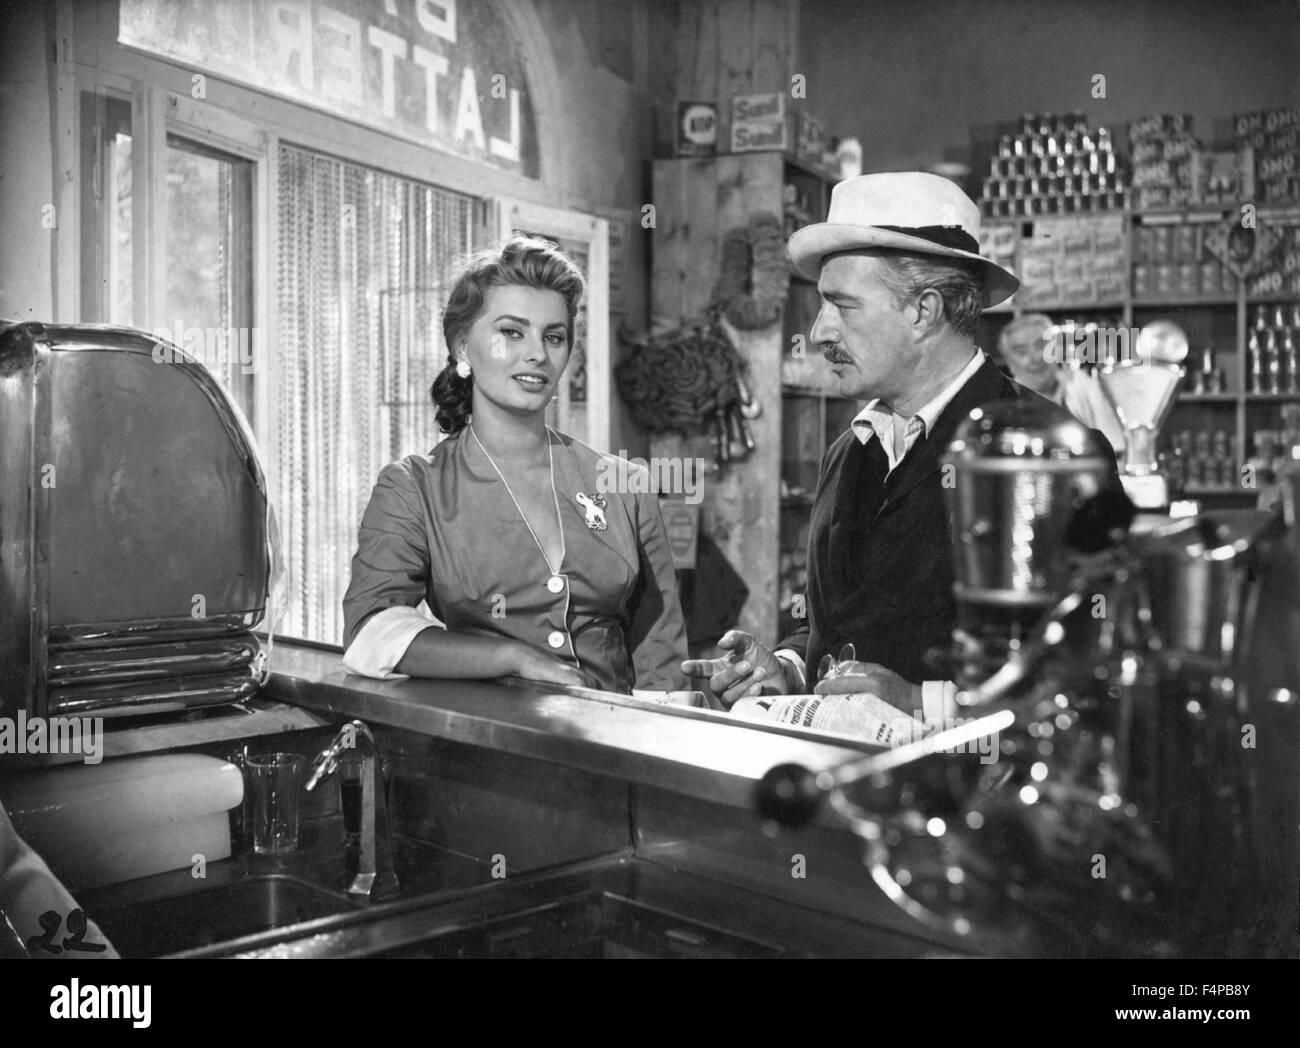 Sophia Loren, Vittorio de Sica / Pain Amour Ainsi Soit-Il 1955 directed by Dino Risi - Stock Image